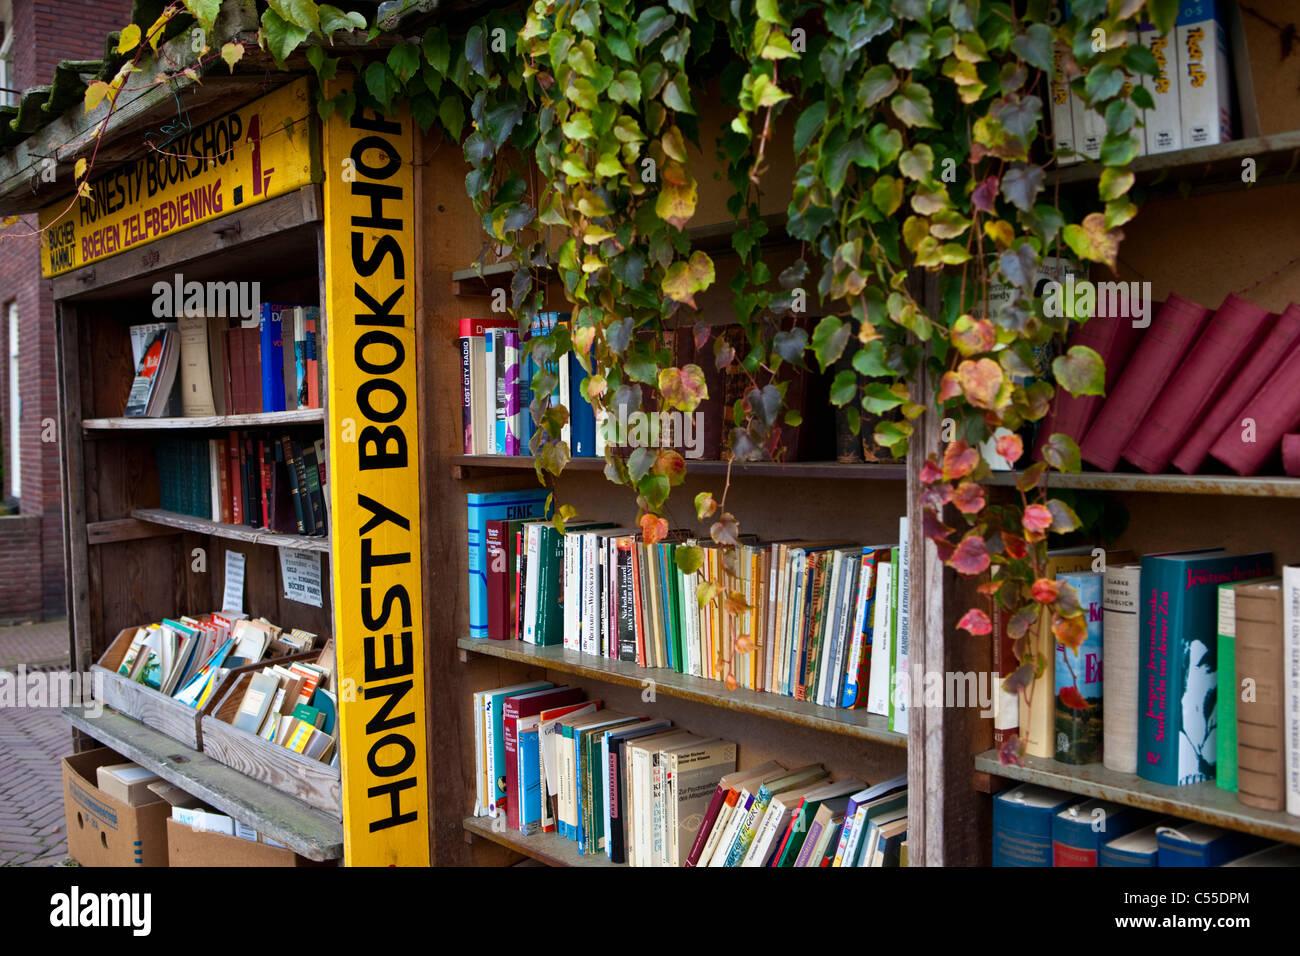 The Netherlands, Bredevoort, Centre of historical village. Antique books shop. - Stock Image